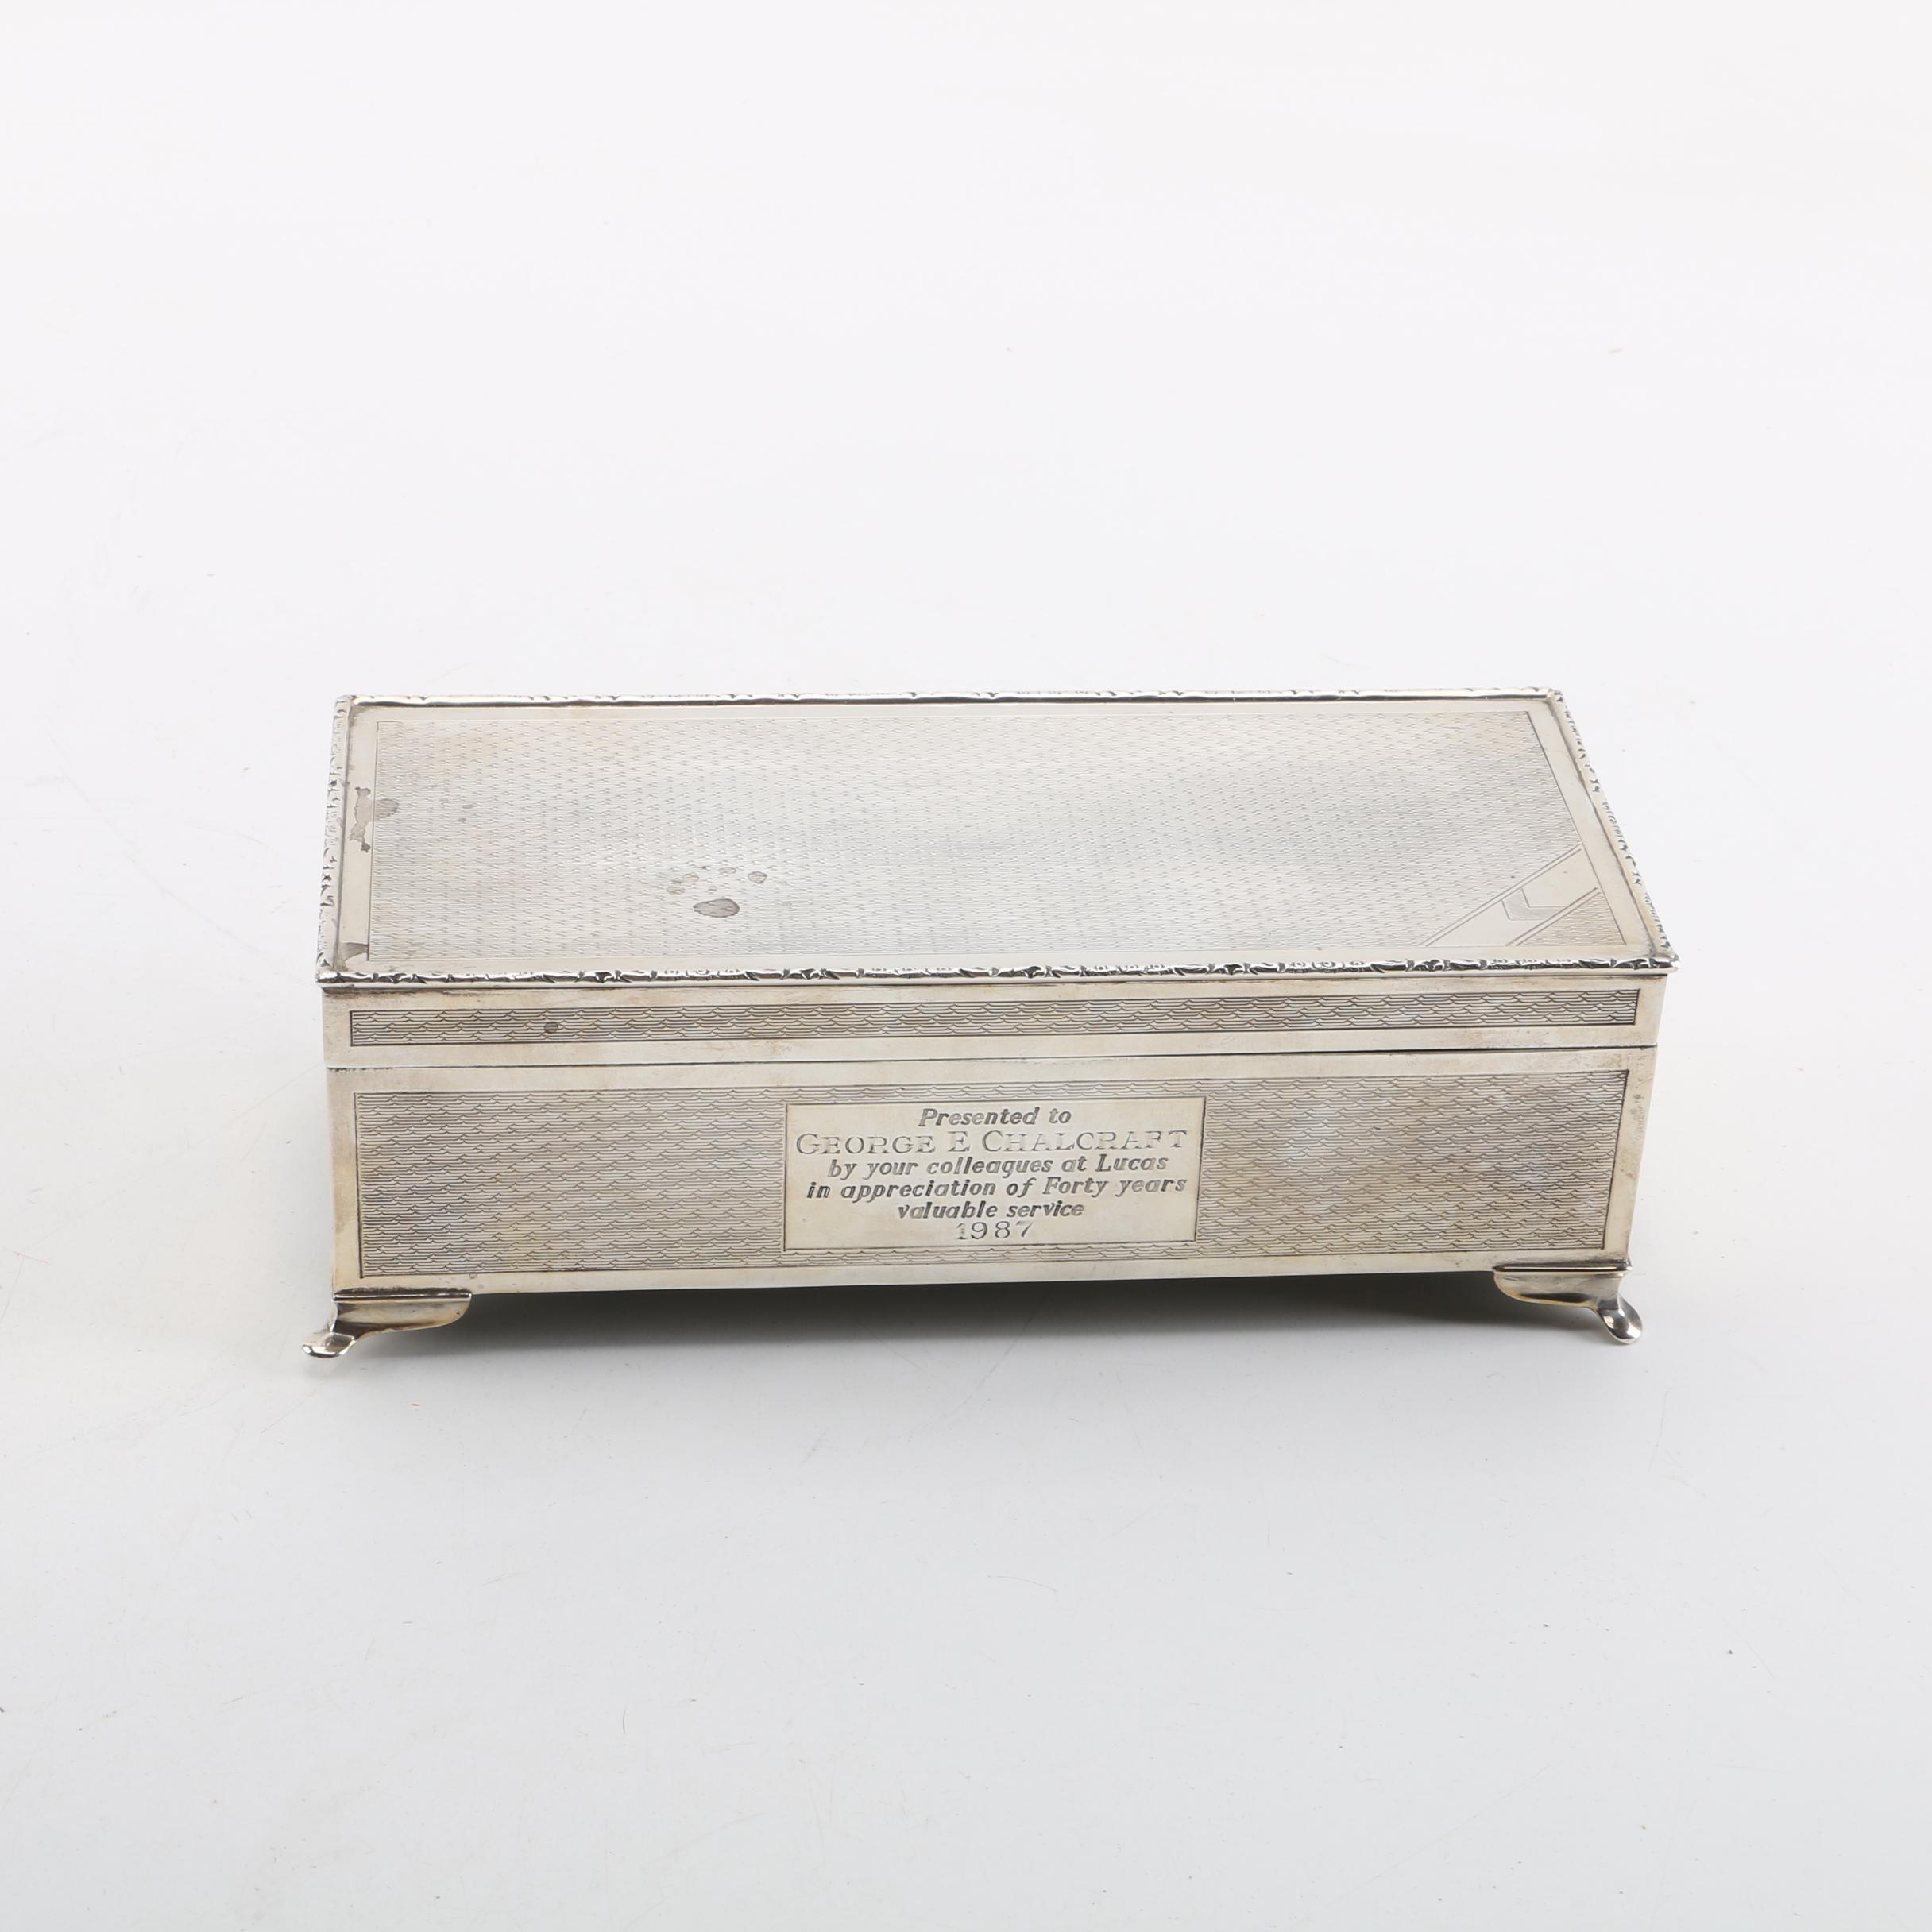 1987 Harman Brothers British Sterling Silver Engraved Cigar Box